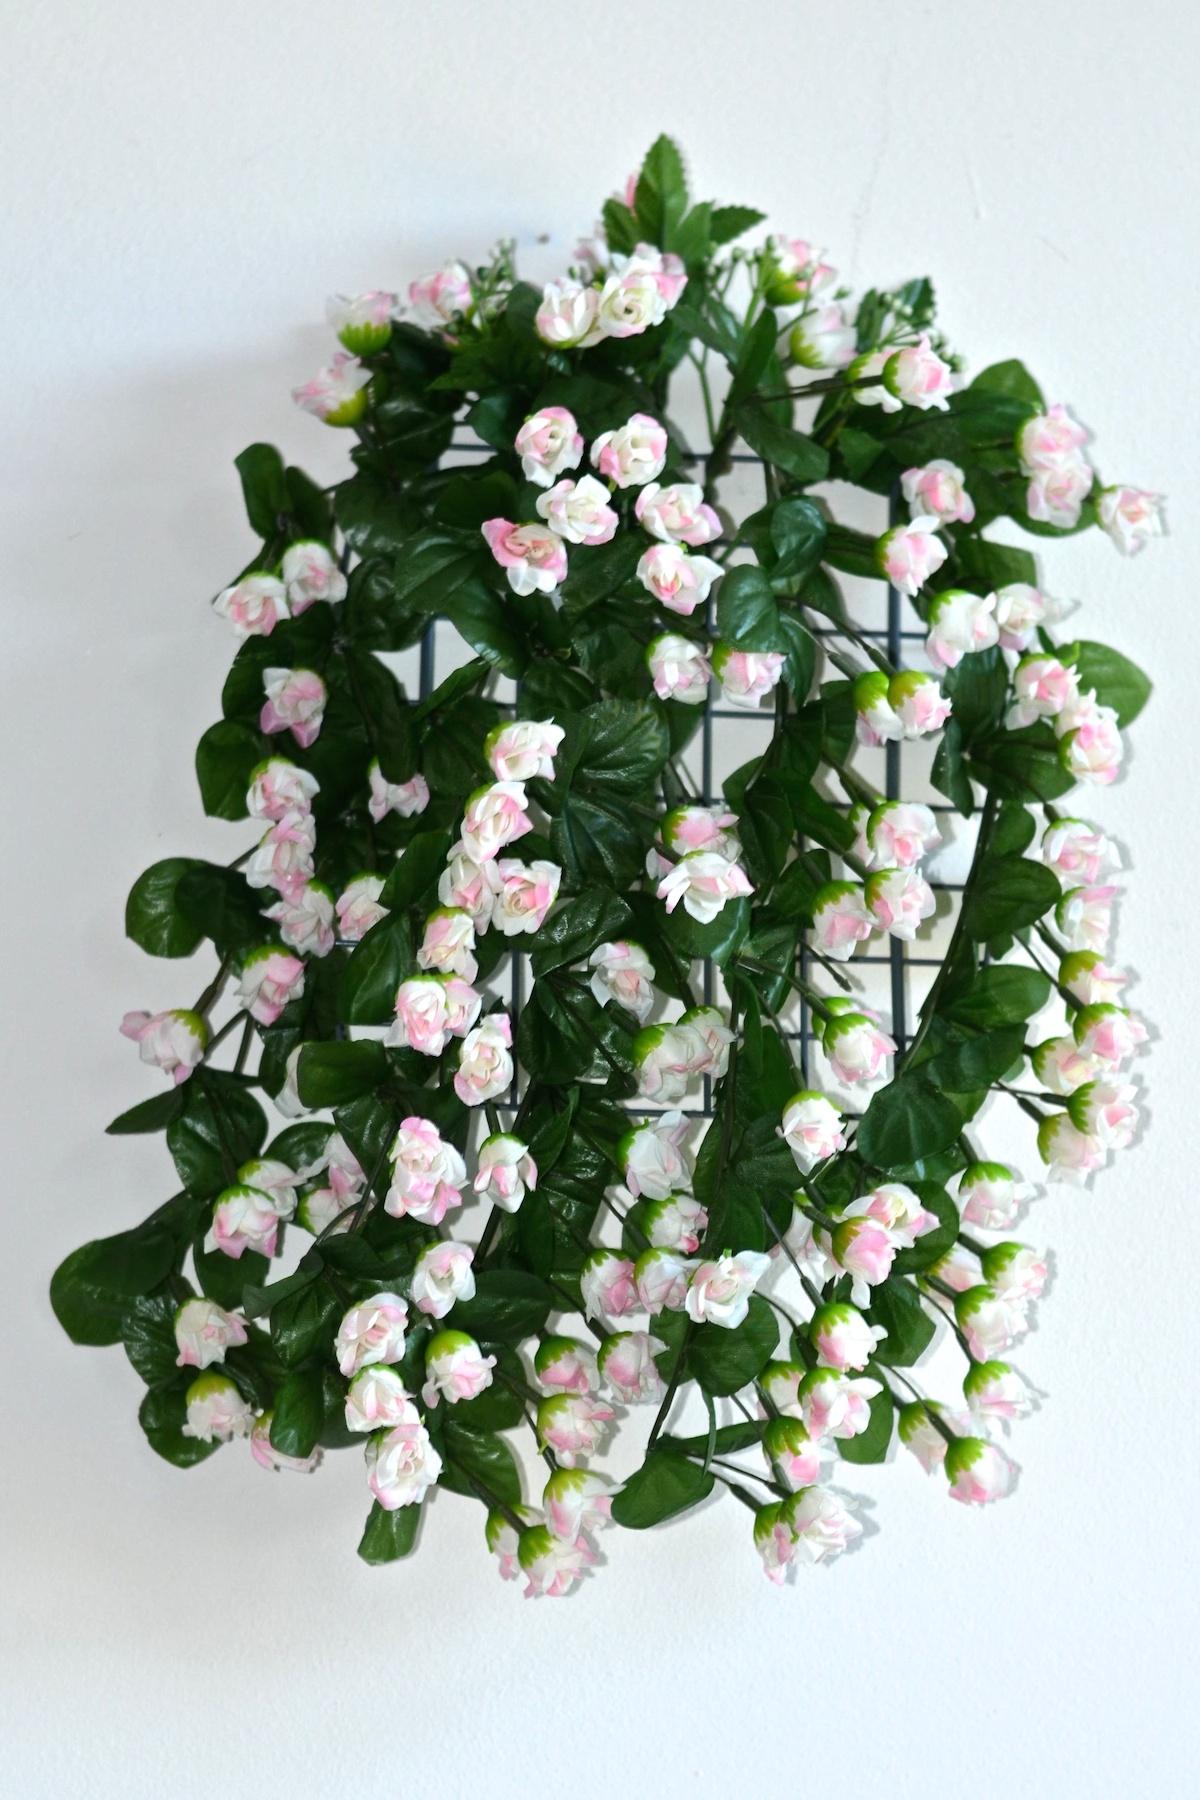 57cm Rosenranke Kunstpflanzen Dekoration Efeugirlande